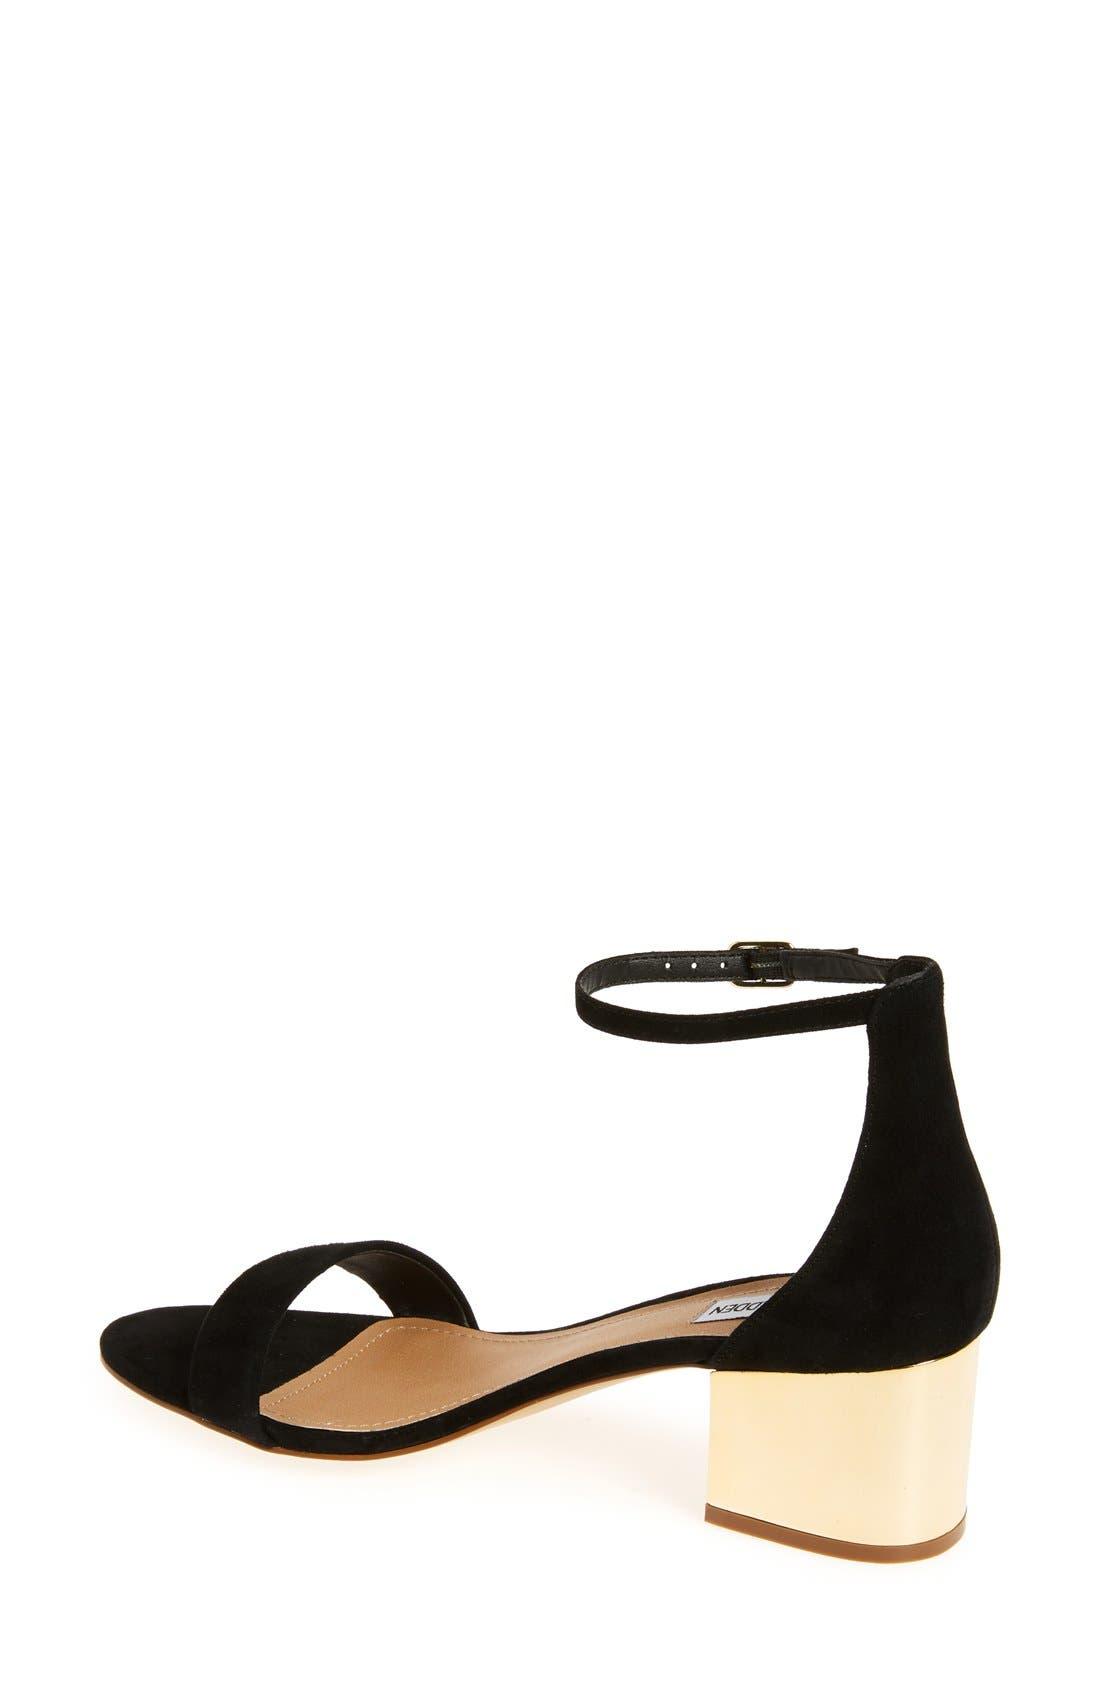 'Irenee-G' Mirror Block Heel Sandal,                             Alternate thumbnail 2, color,                             006